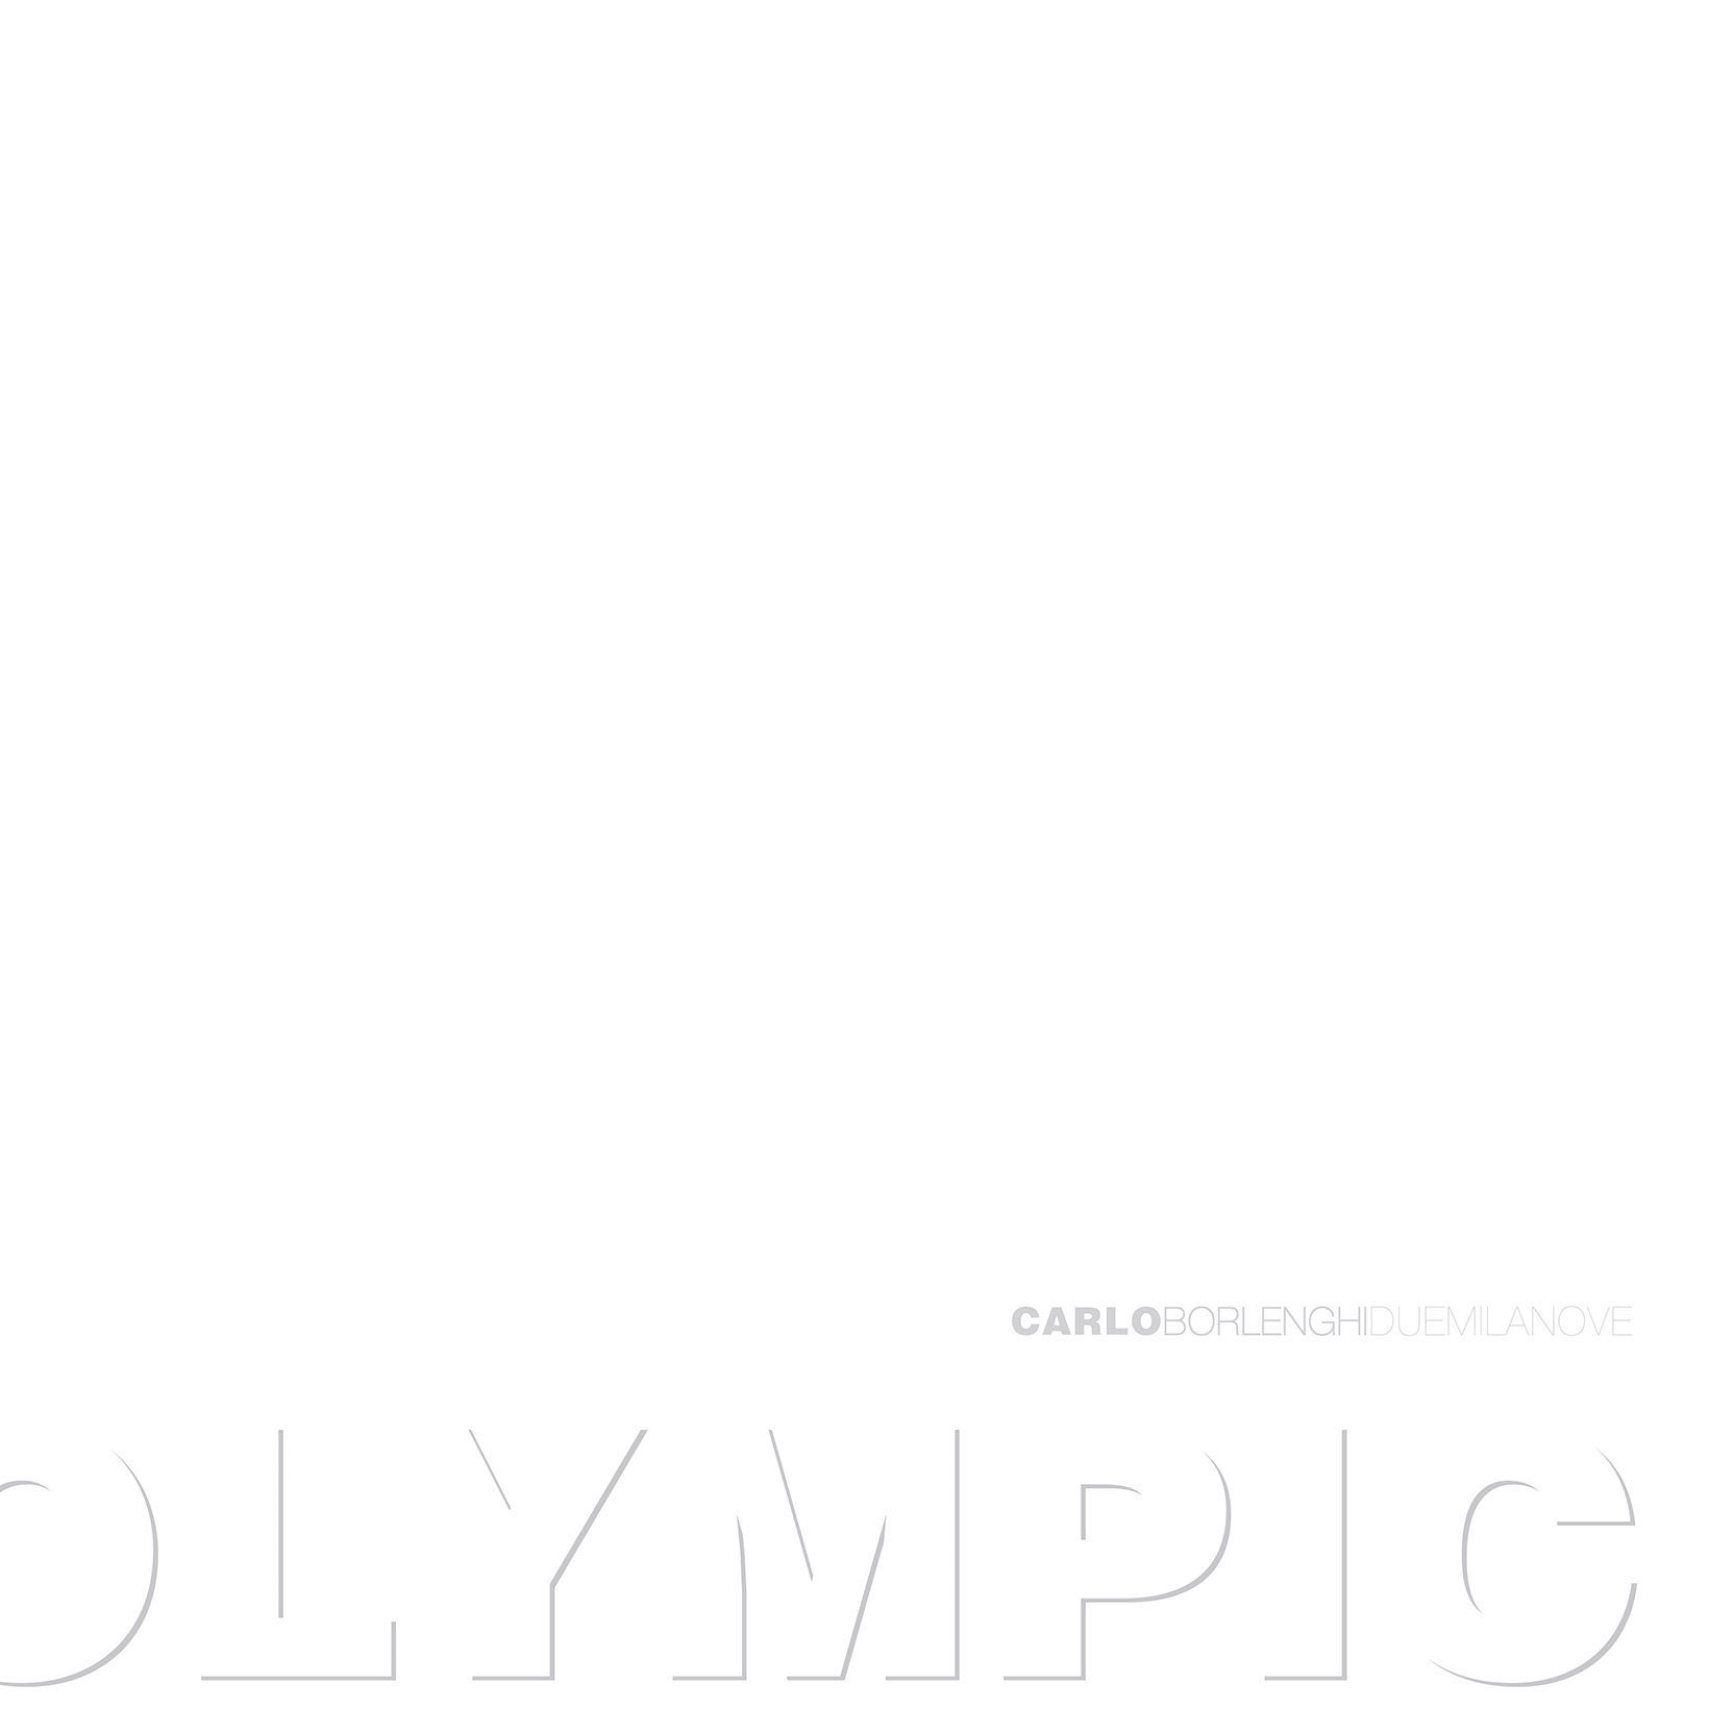 0139_2009